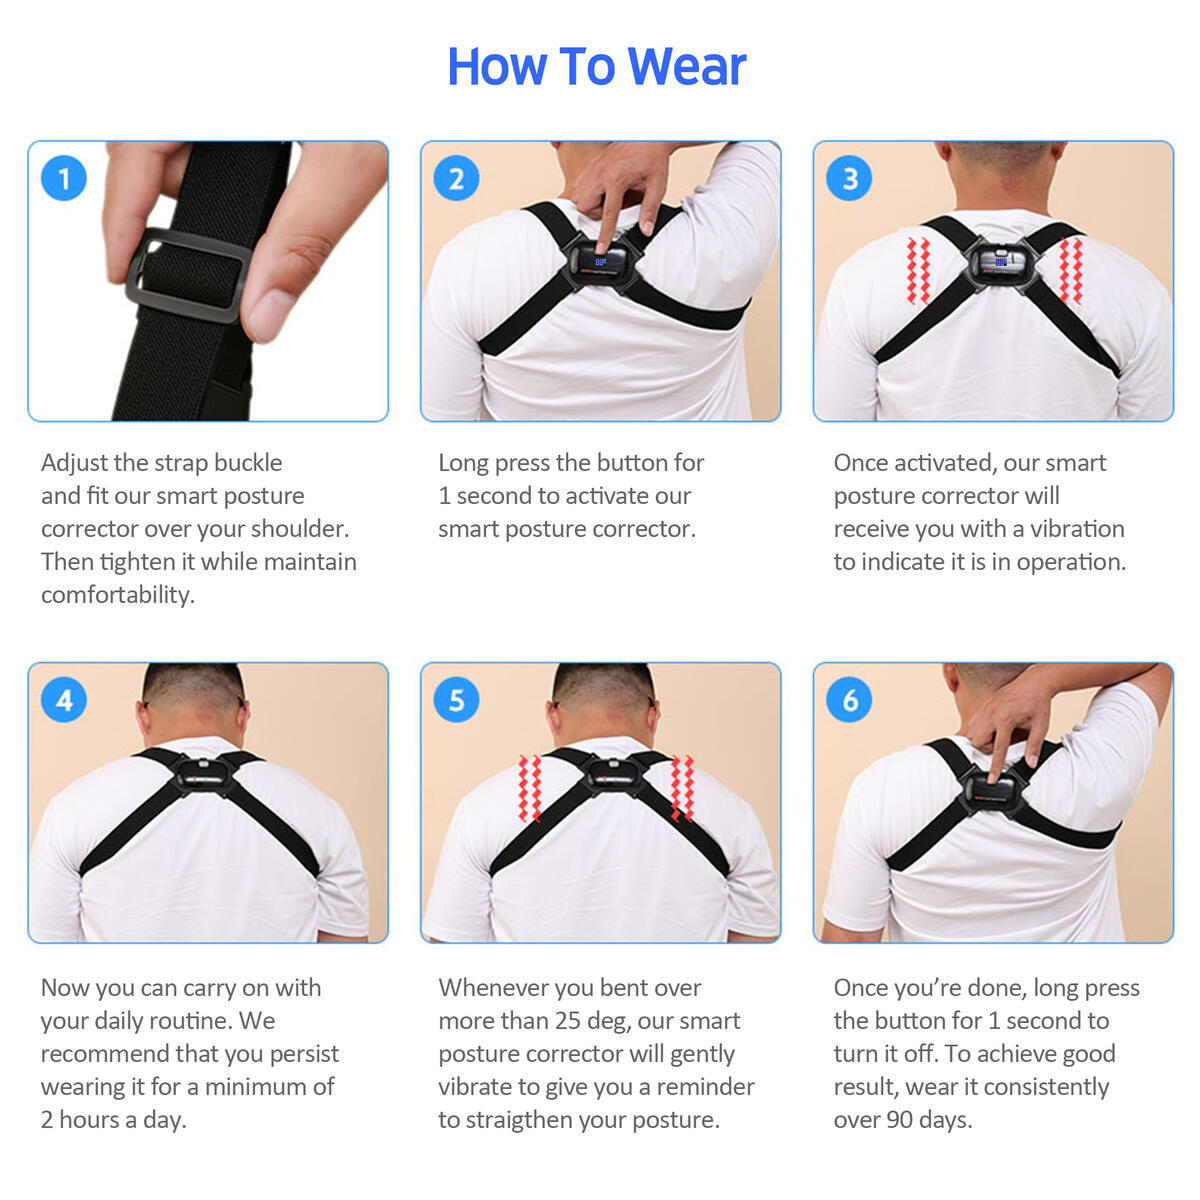 Acbex Smart Posture Corrector for Women, Men & Kids (Black) - FREE SHIPPING